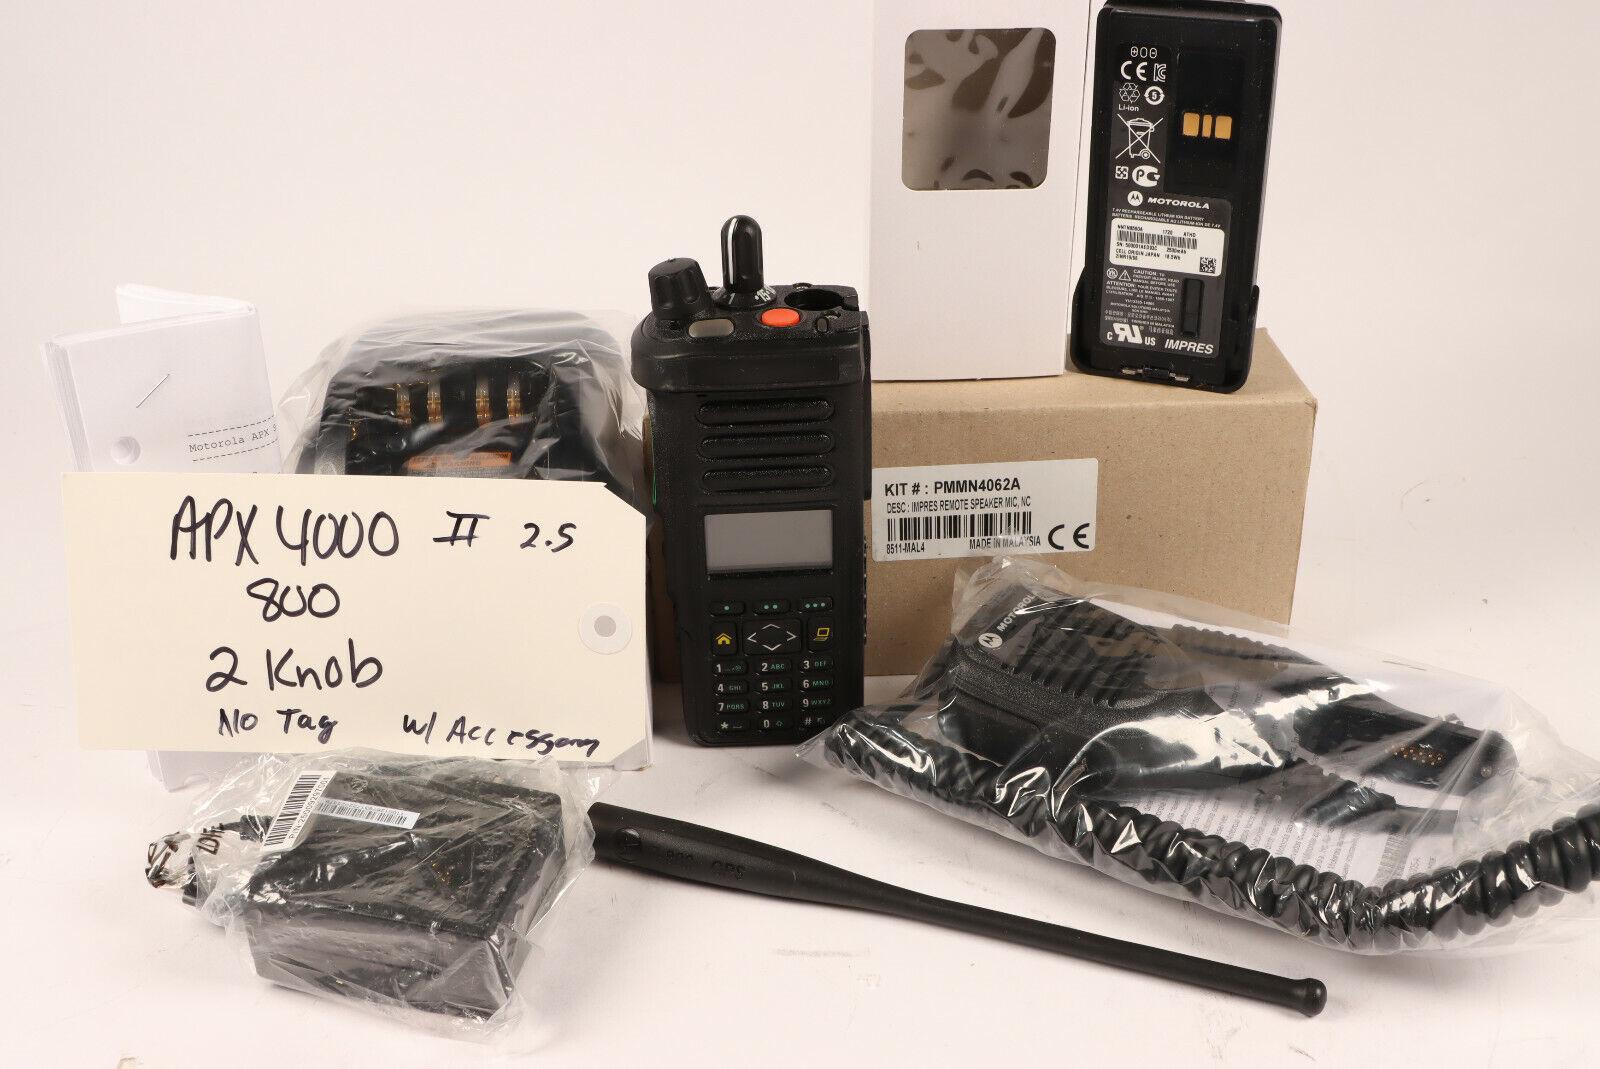 Motorola APX4000 /XE 700-800MHz+5 Algo's + Bluetooth (2) knob*Tech Special *Read. Buy it now for 1000.00